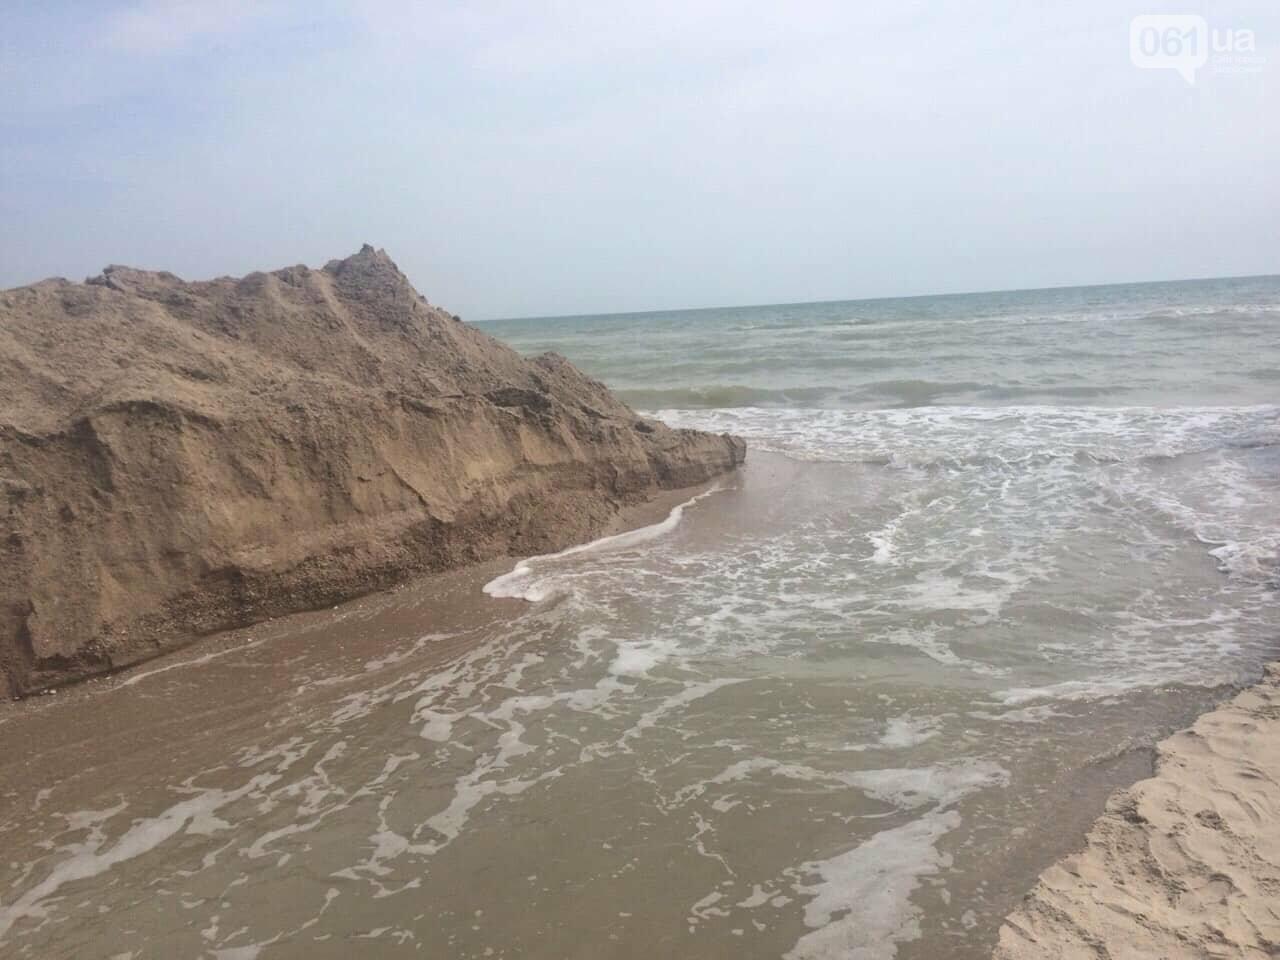 Промоину, соединяющую лиман с Азовским морем, открыли, - ФОТО , фото-1